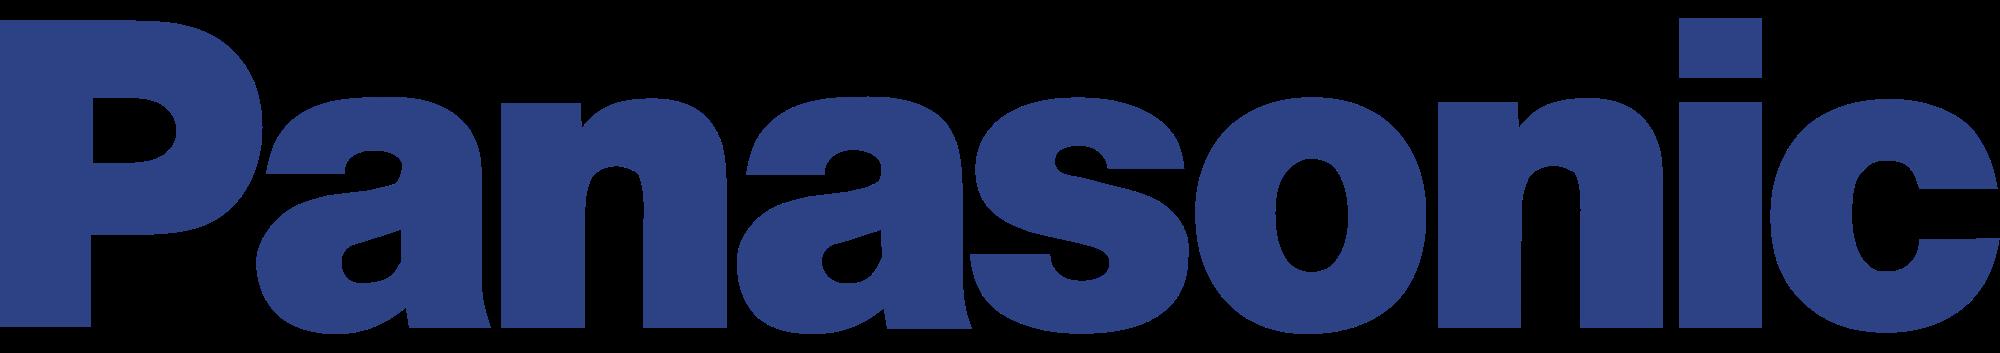 Panasonic_svg